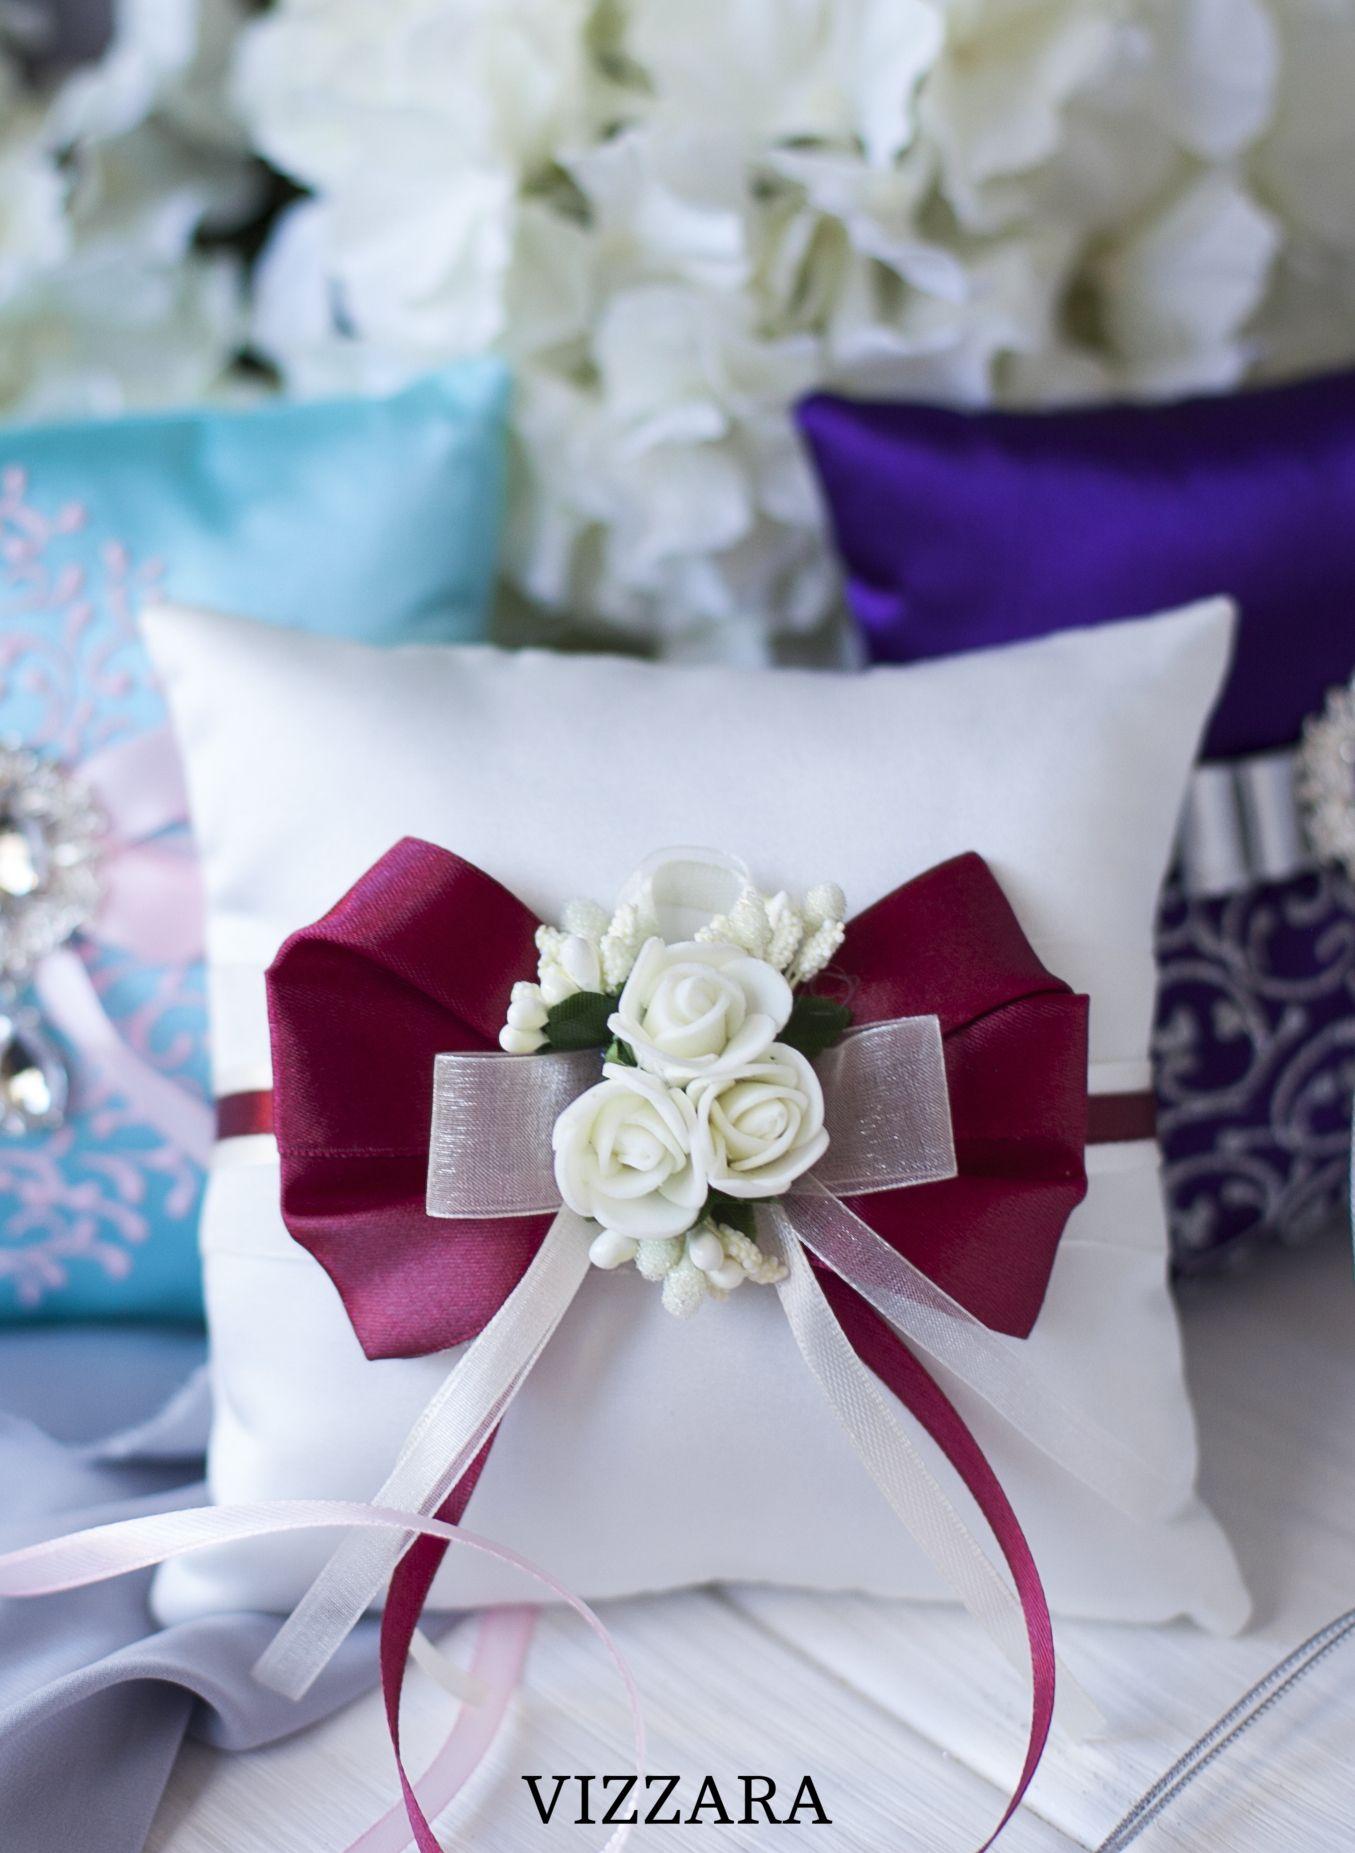 Lillian Rose Purple Flower Wedding Ring Pillow